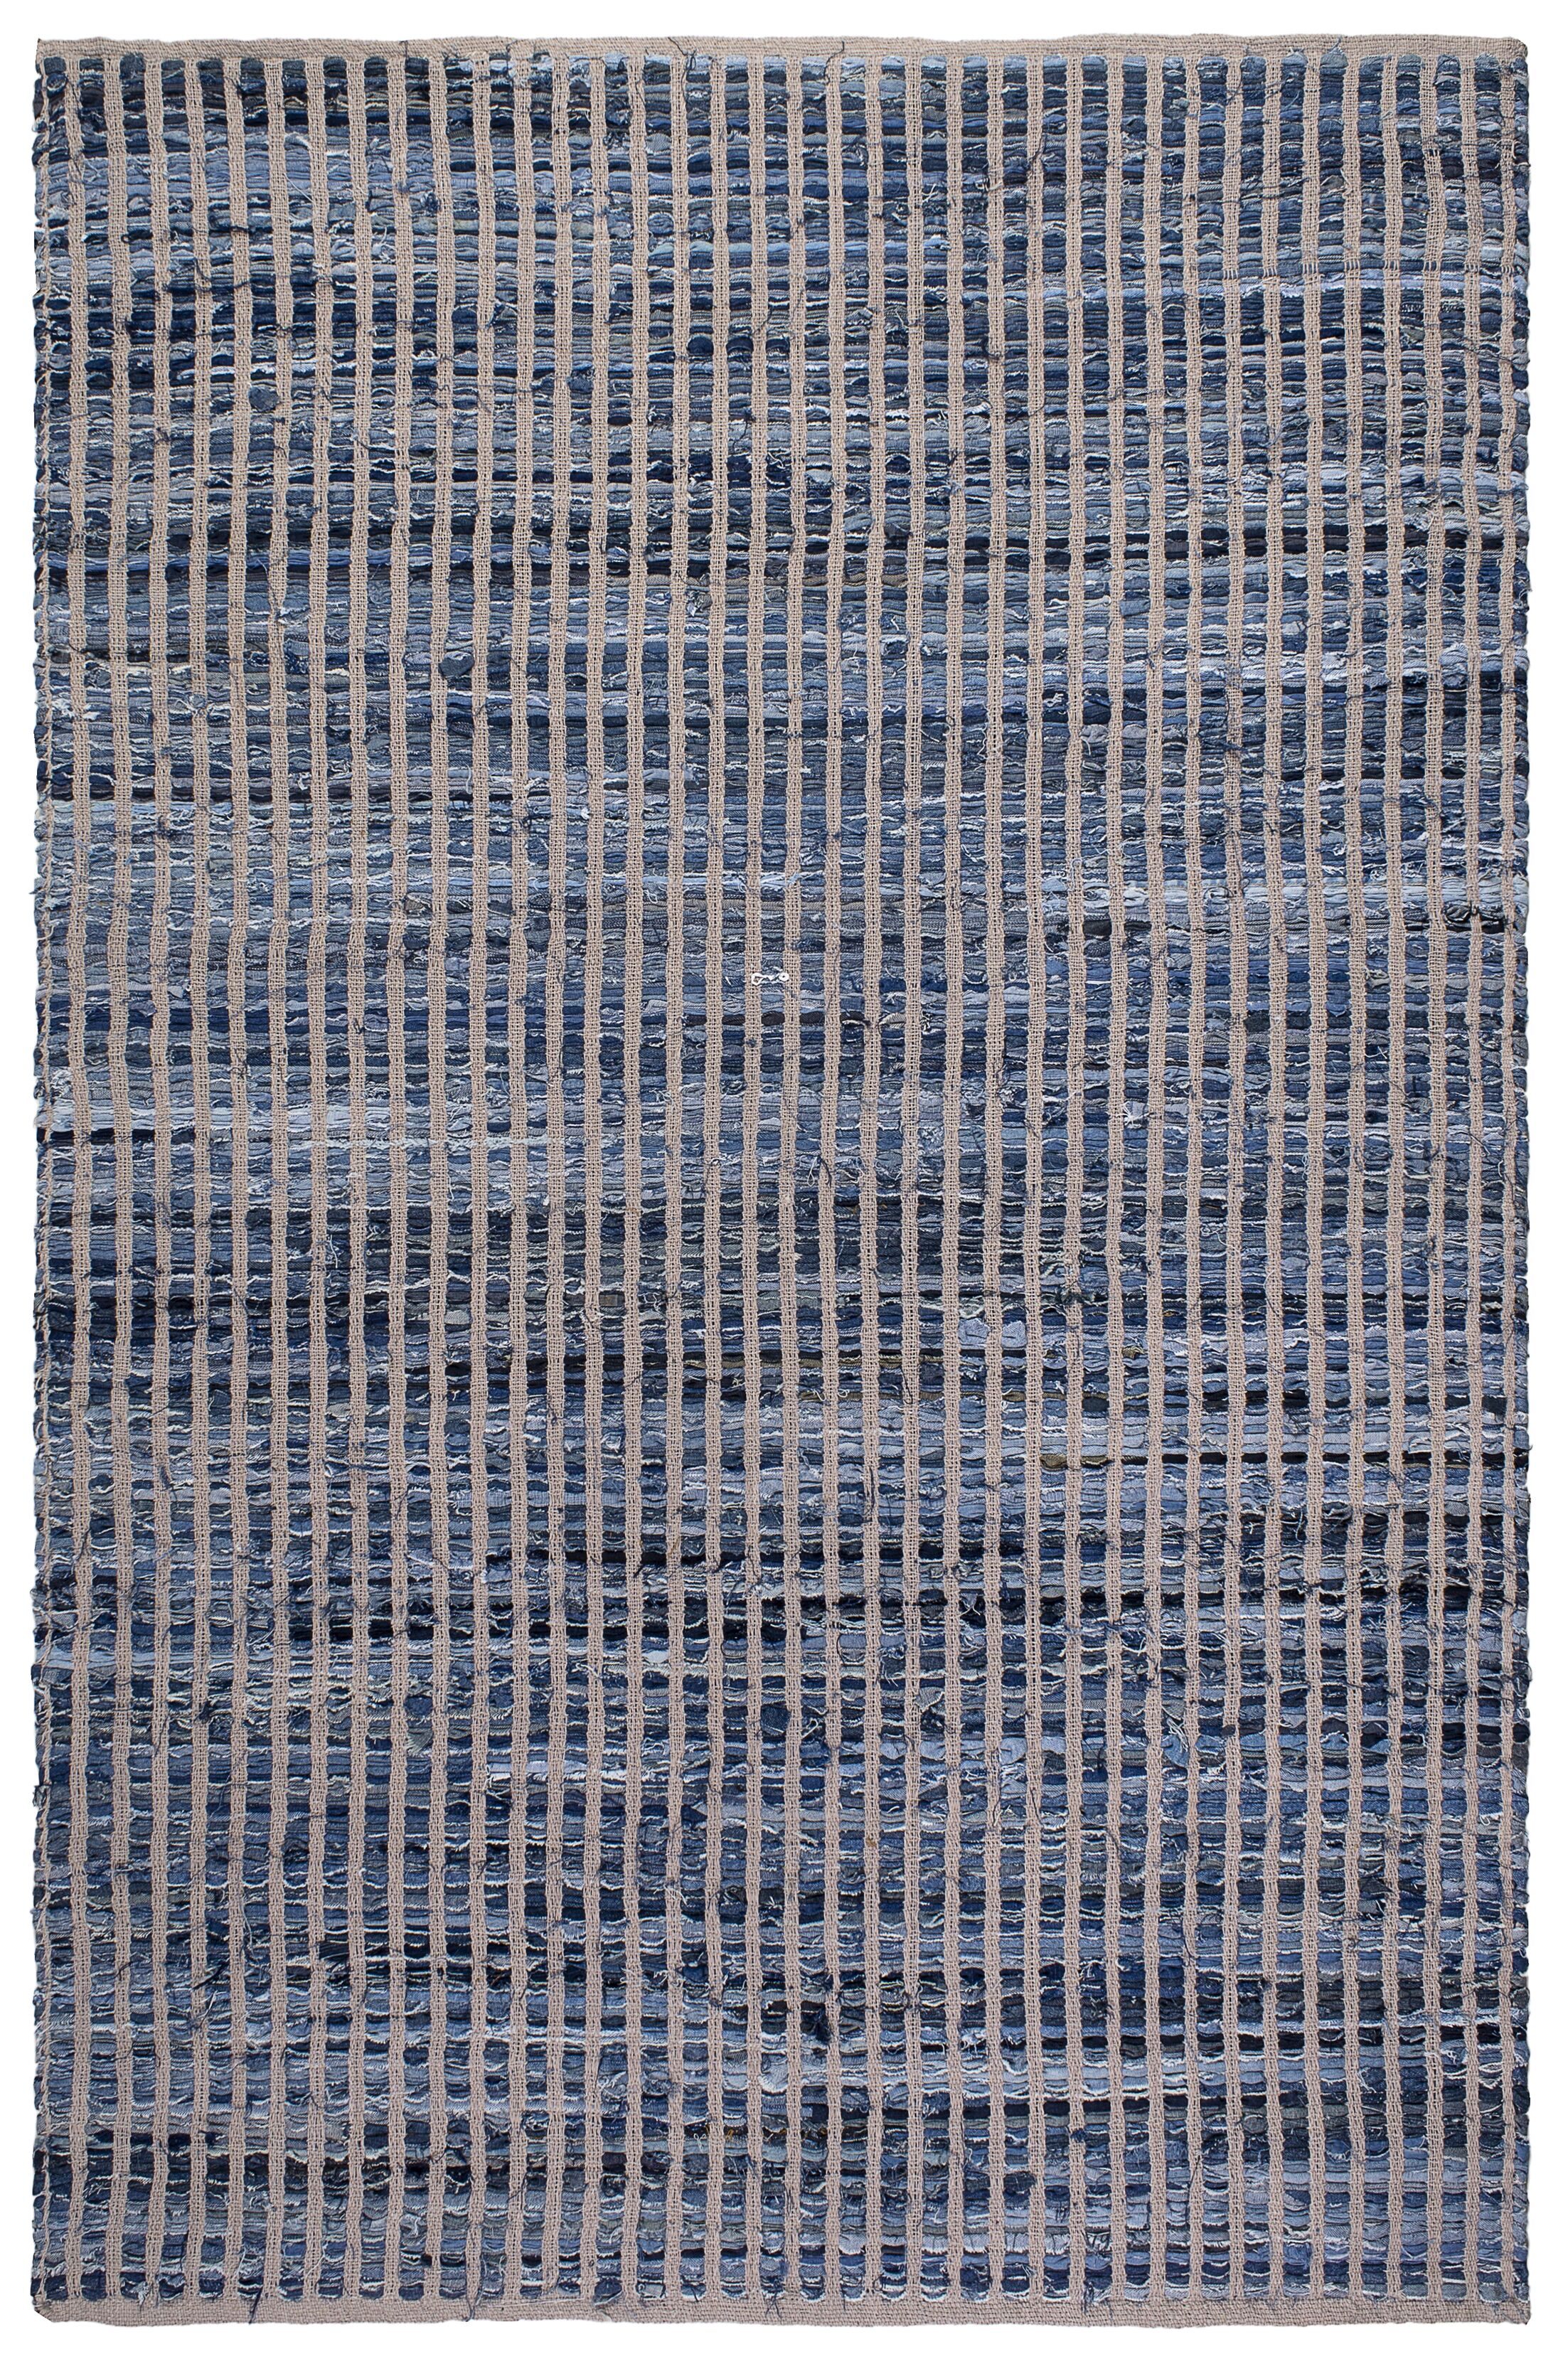 Zen Vienna Hand-Woven Blue/Gray Area Rug Rug Size: 8' x 10'